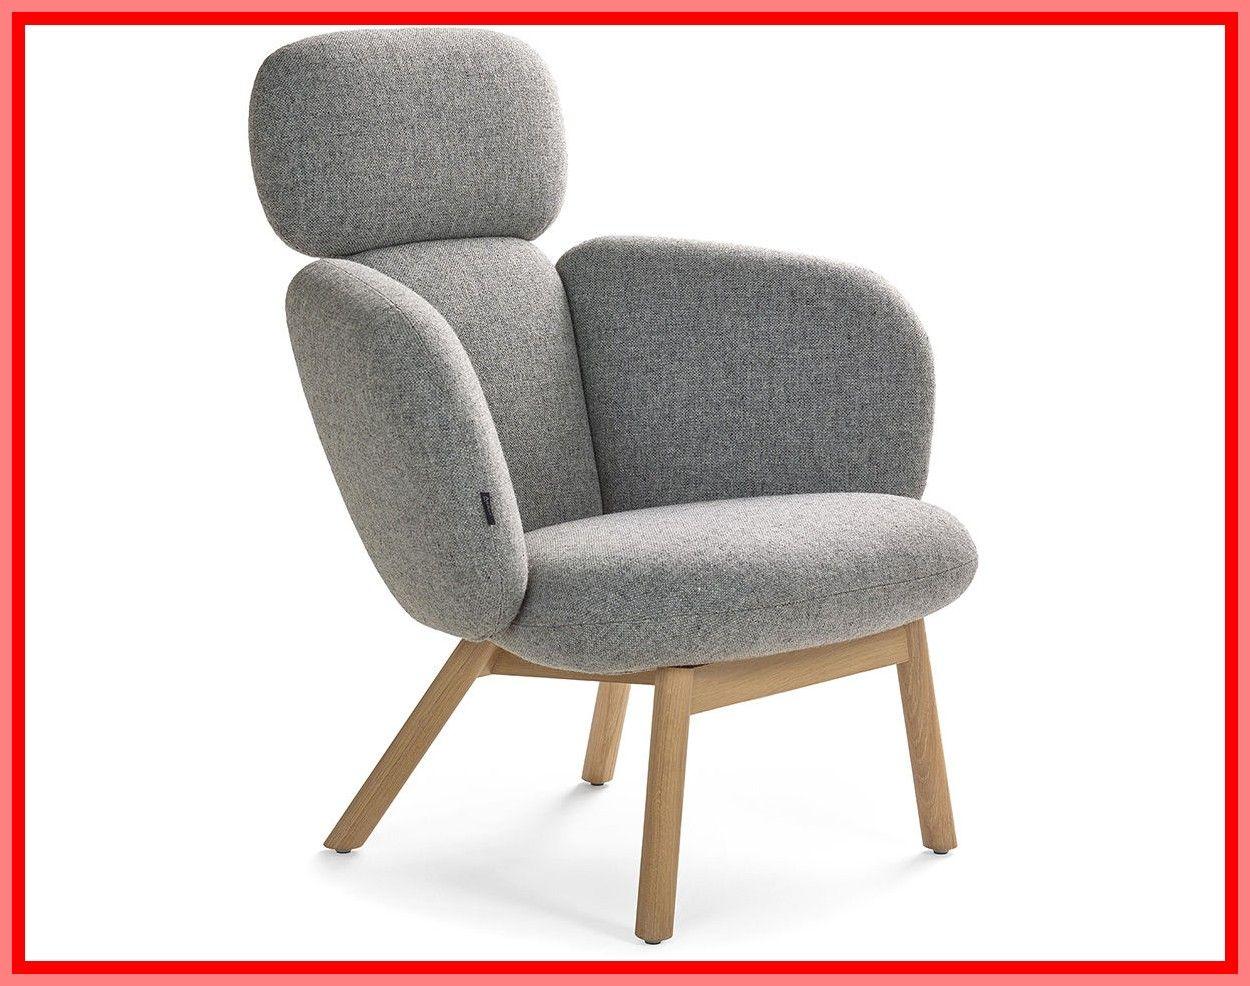 Used Patio Furniture For Sale In Woodbridge Va